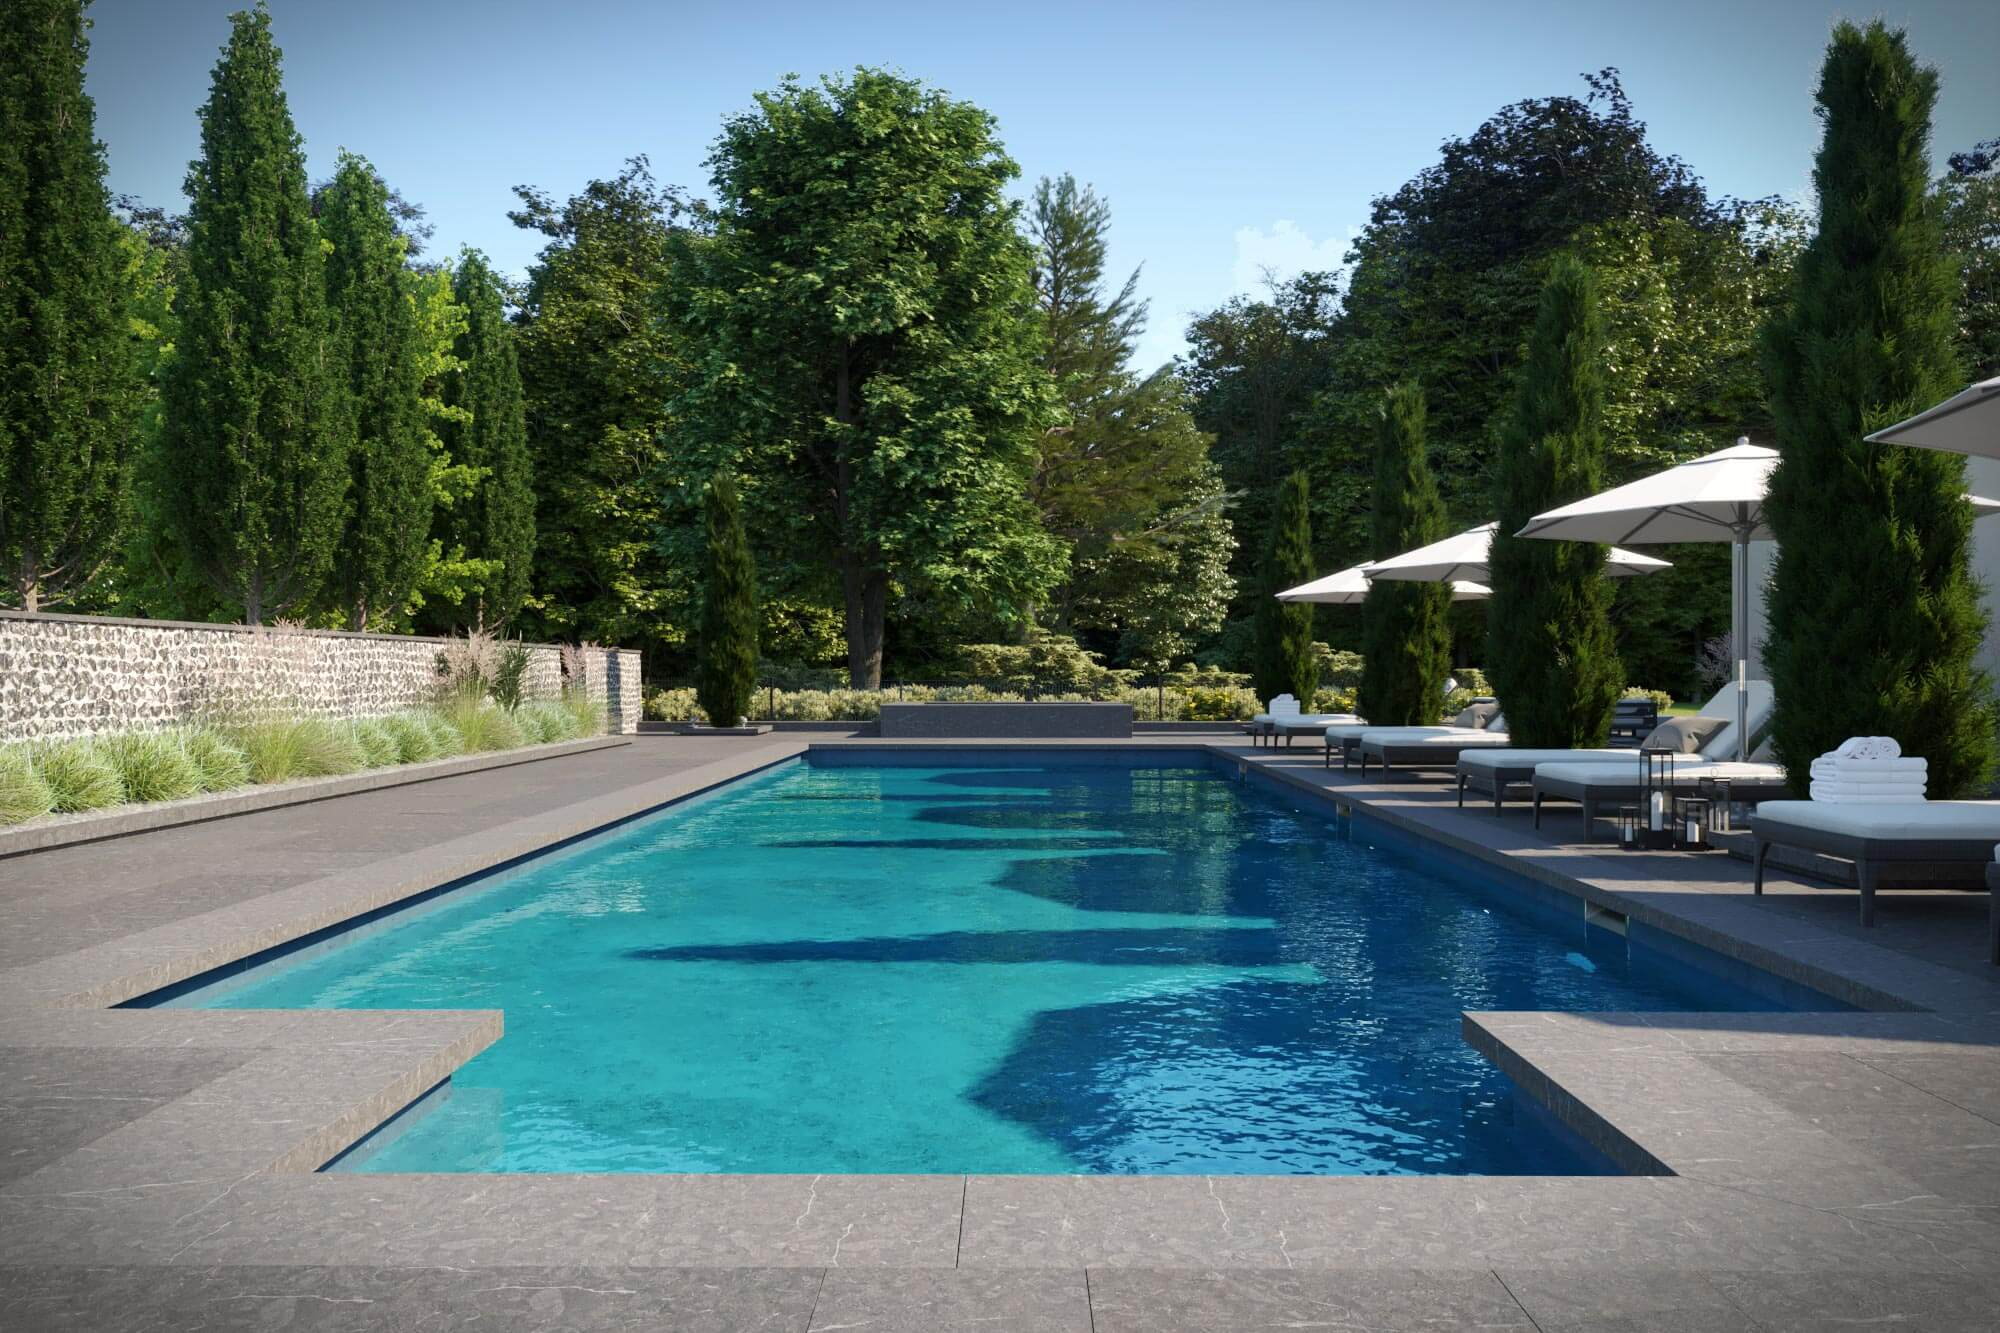 Outdoor Pool And Spa Installation Chichester Aqua Platinum